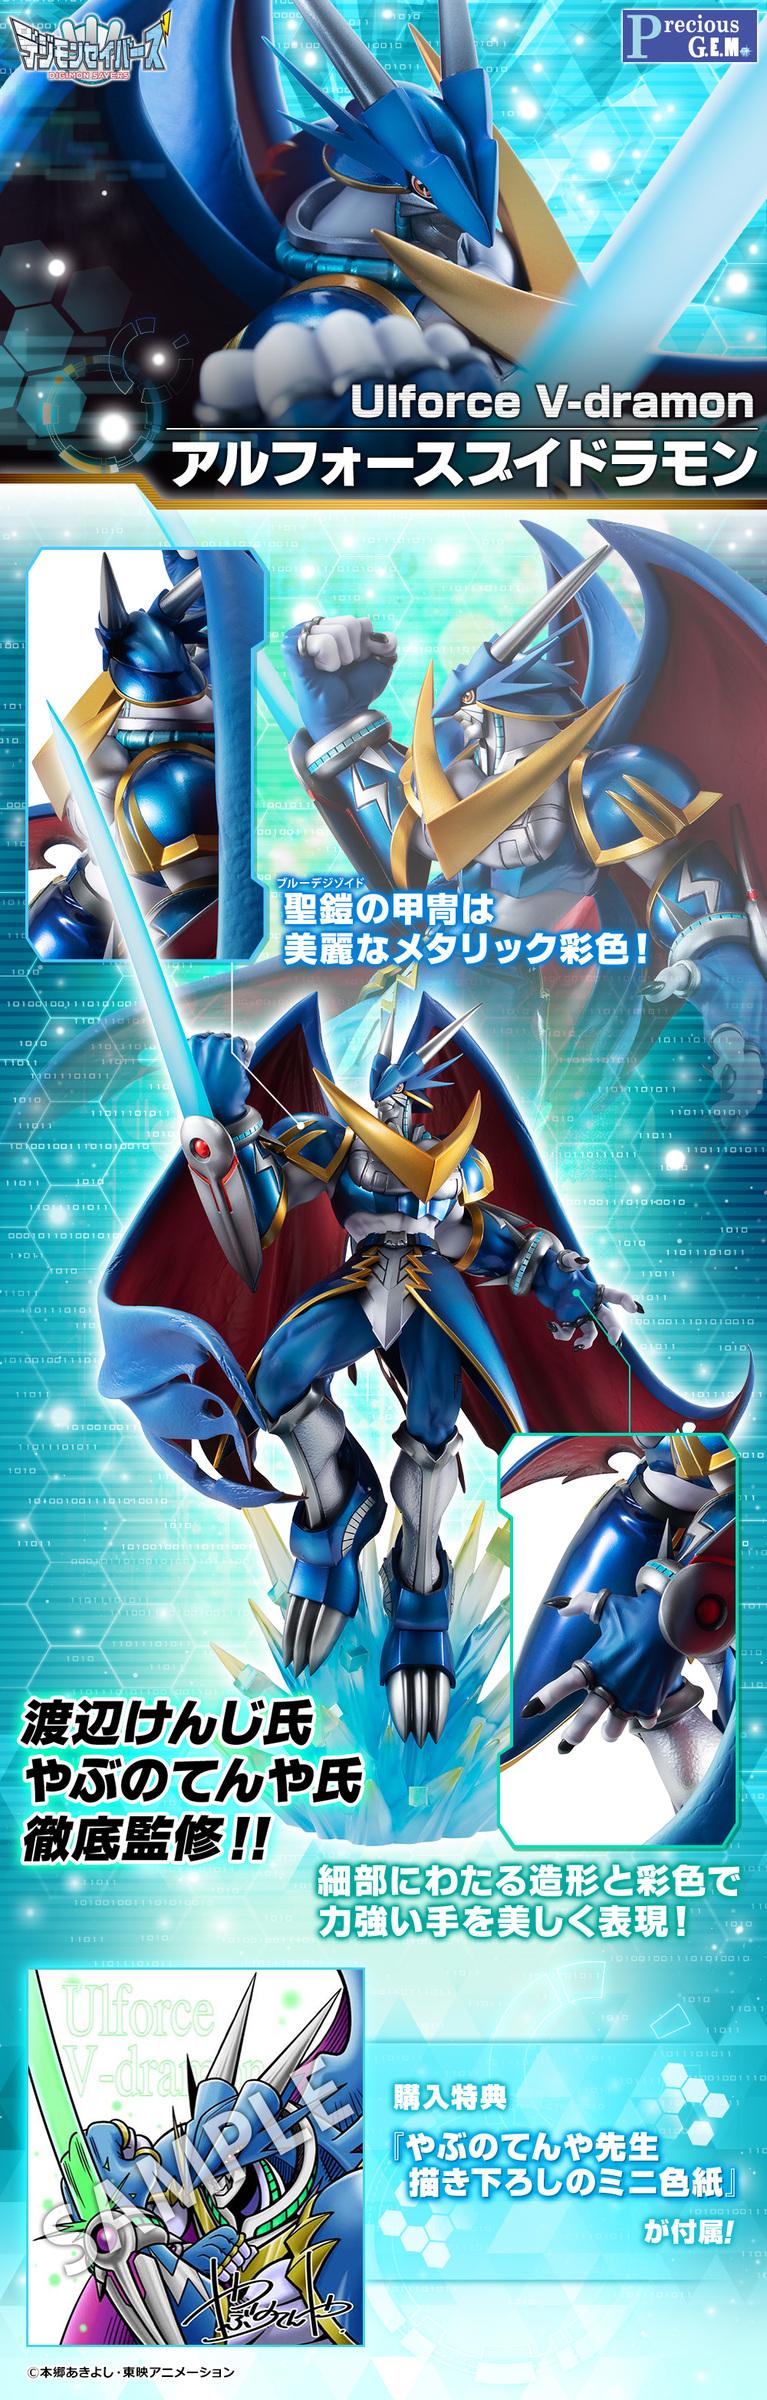 (829147) Precious G.E.M. Series Digimon Adventure Alforths budramon.jpg